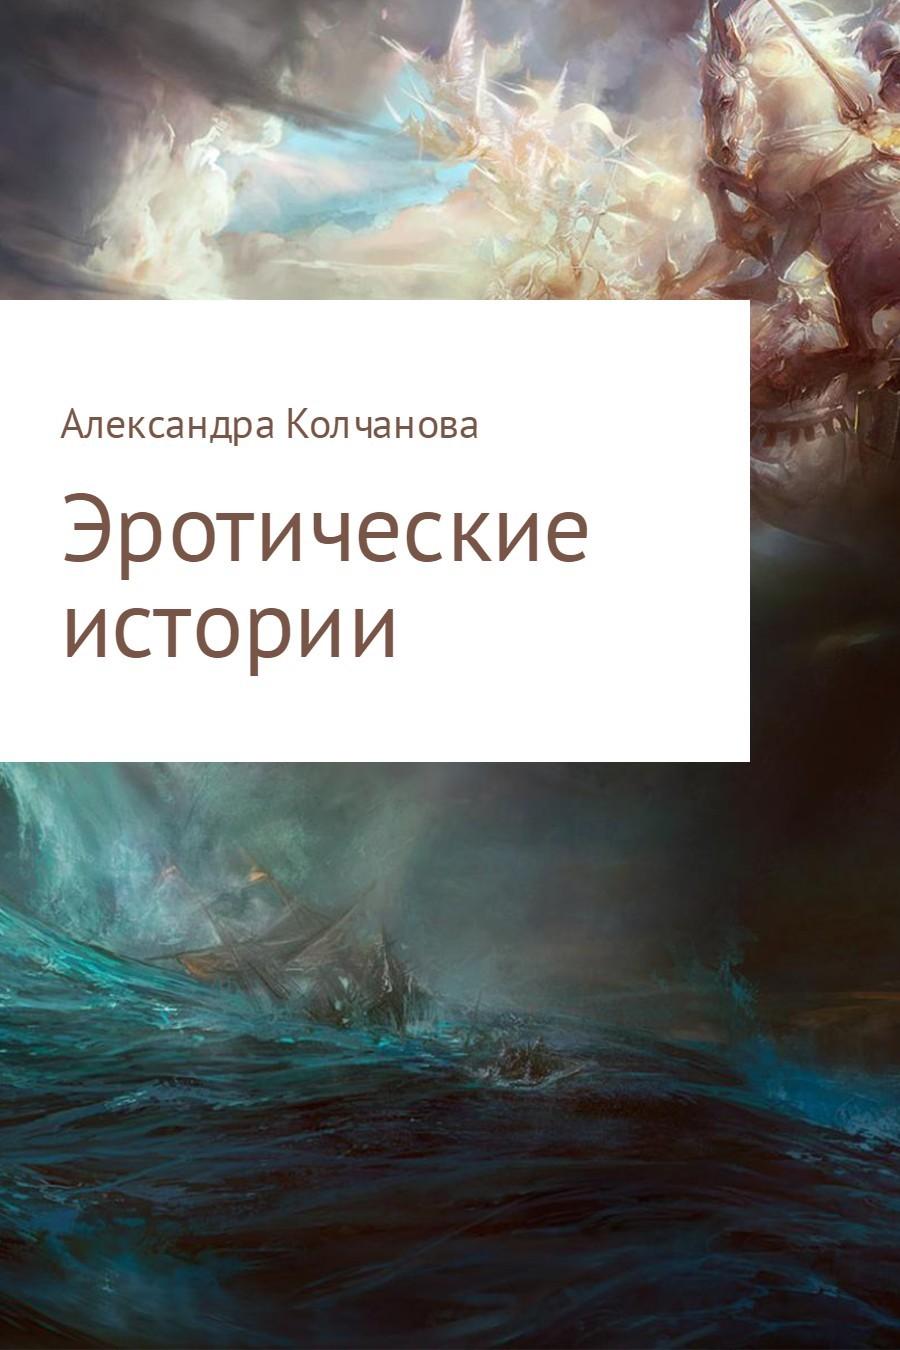 Александра Колчанова - Эротические истории